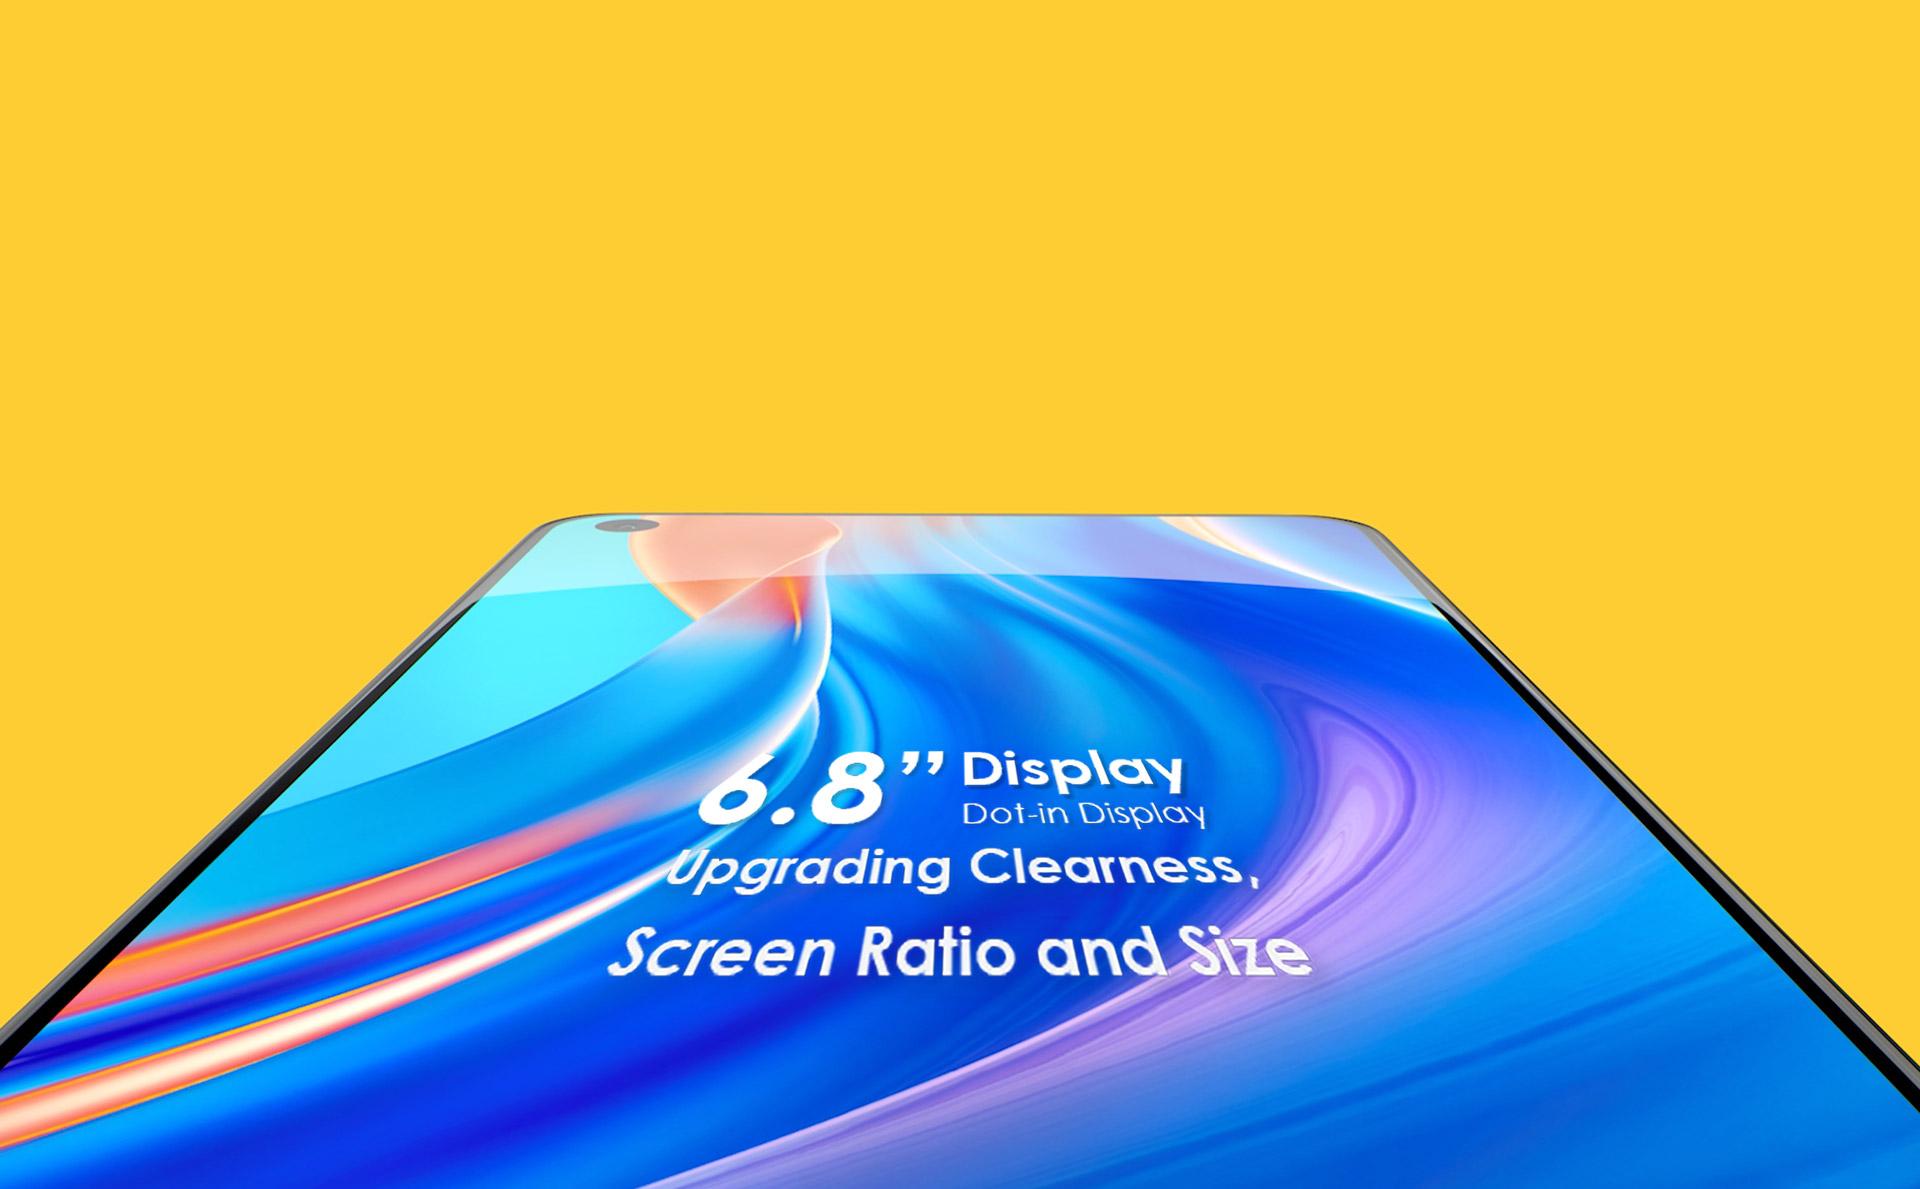 "6.8"" Dot-in Display"